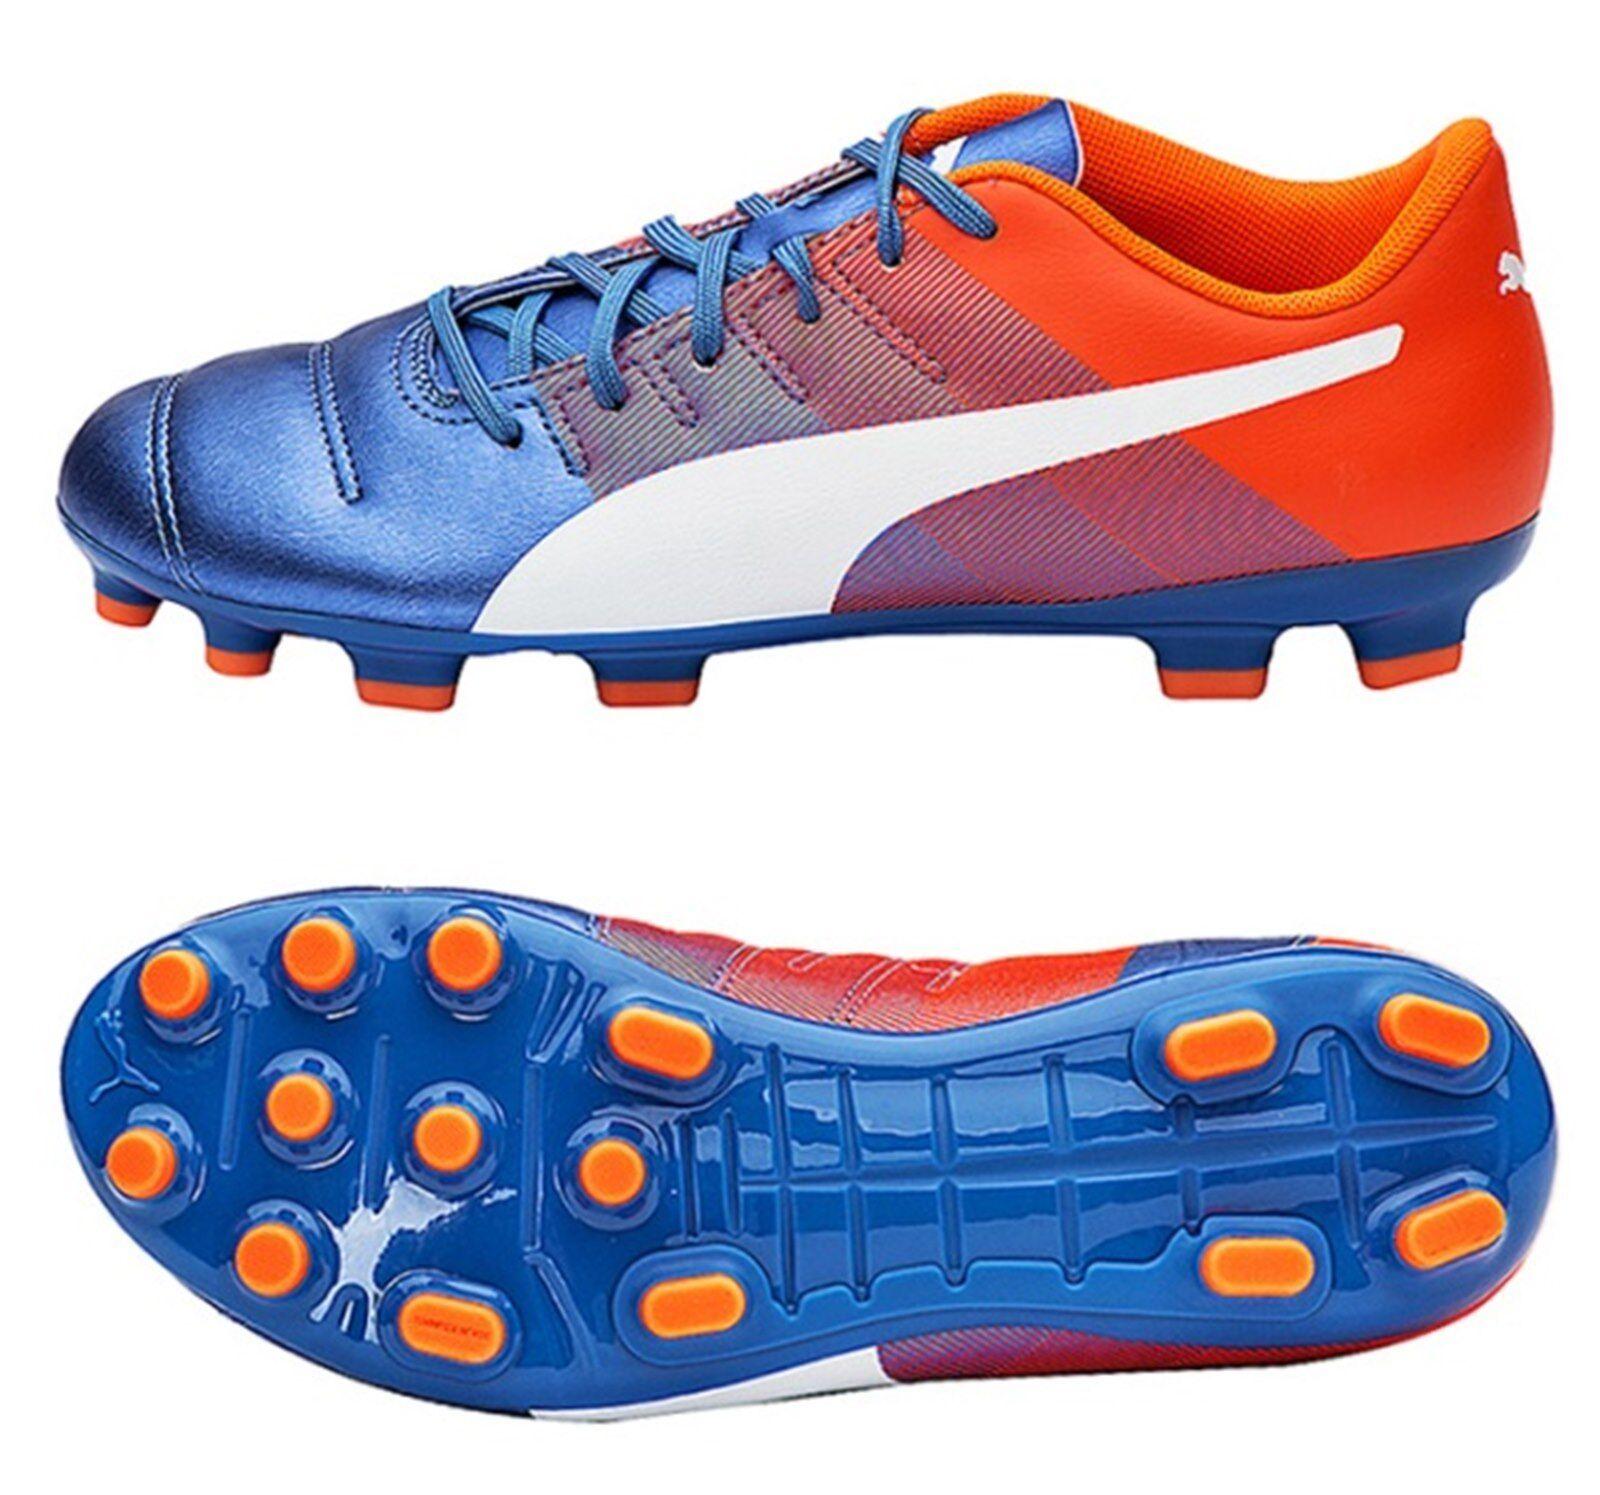 Puma Para Hombre Evo-Potencia 4.3 AG Botines Zapatos de fútbol de pico azul 103538-03